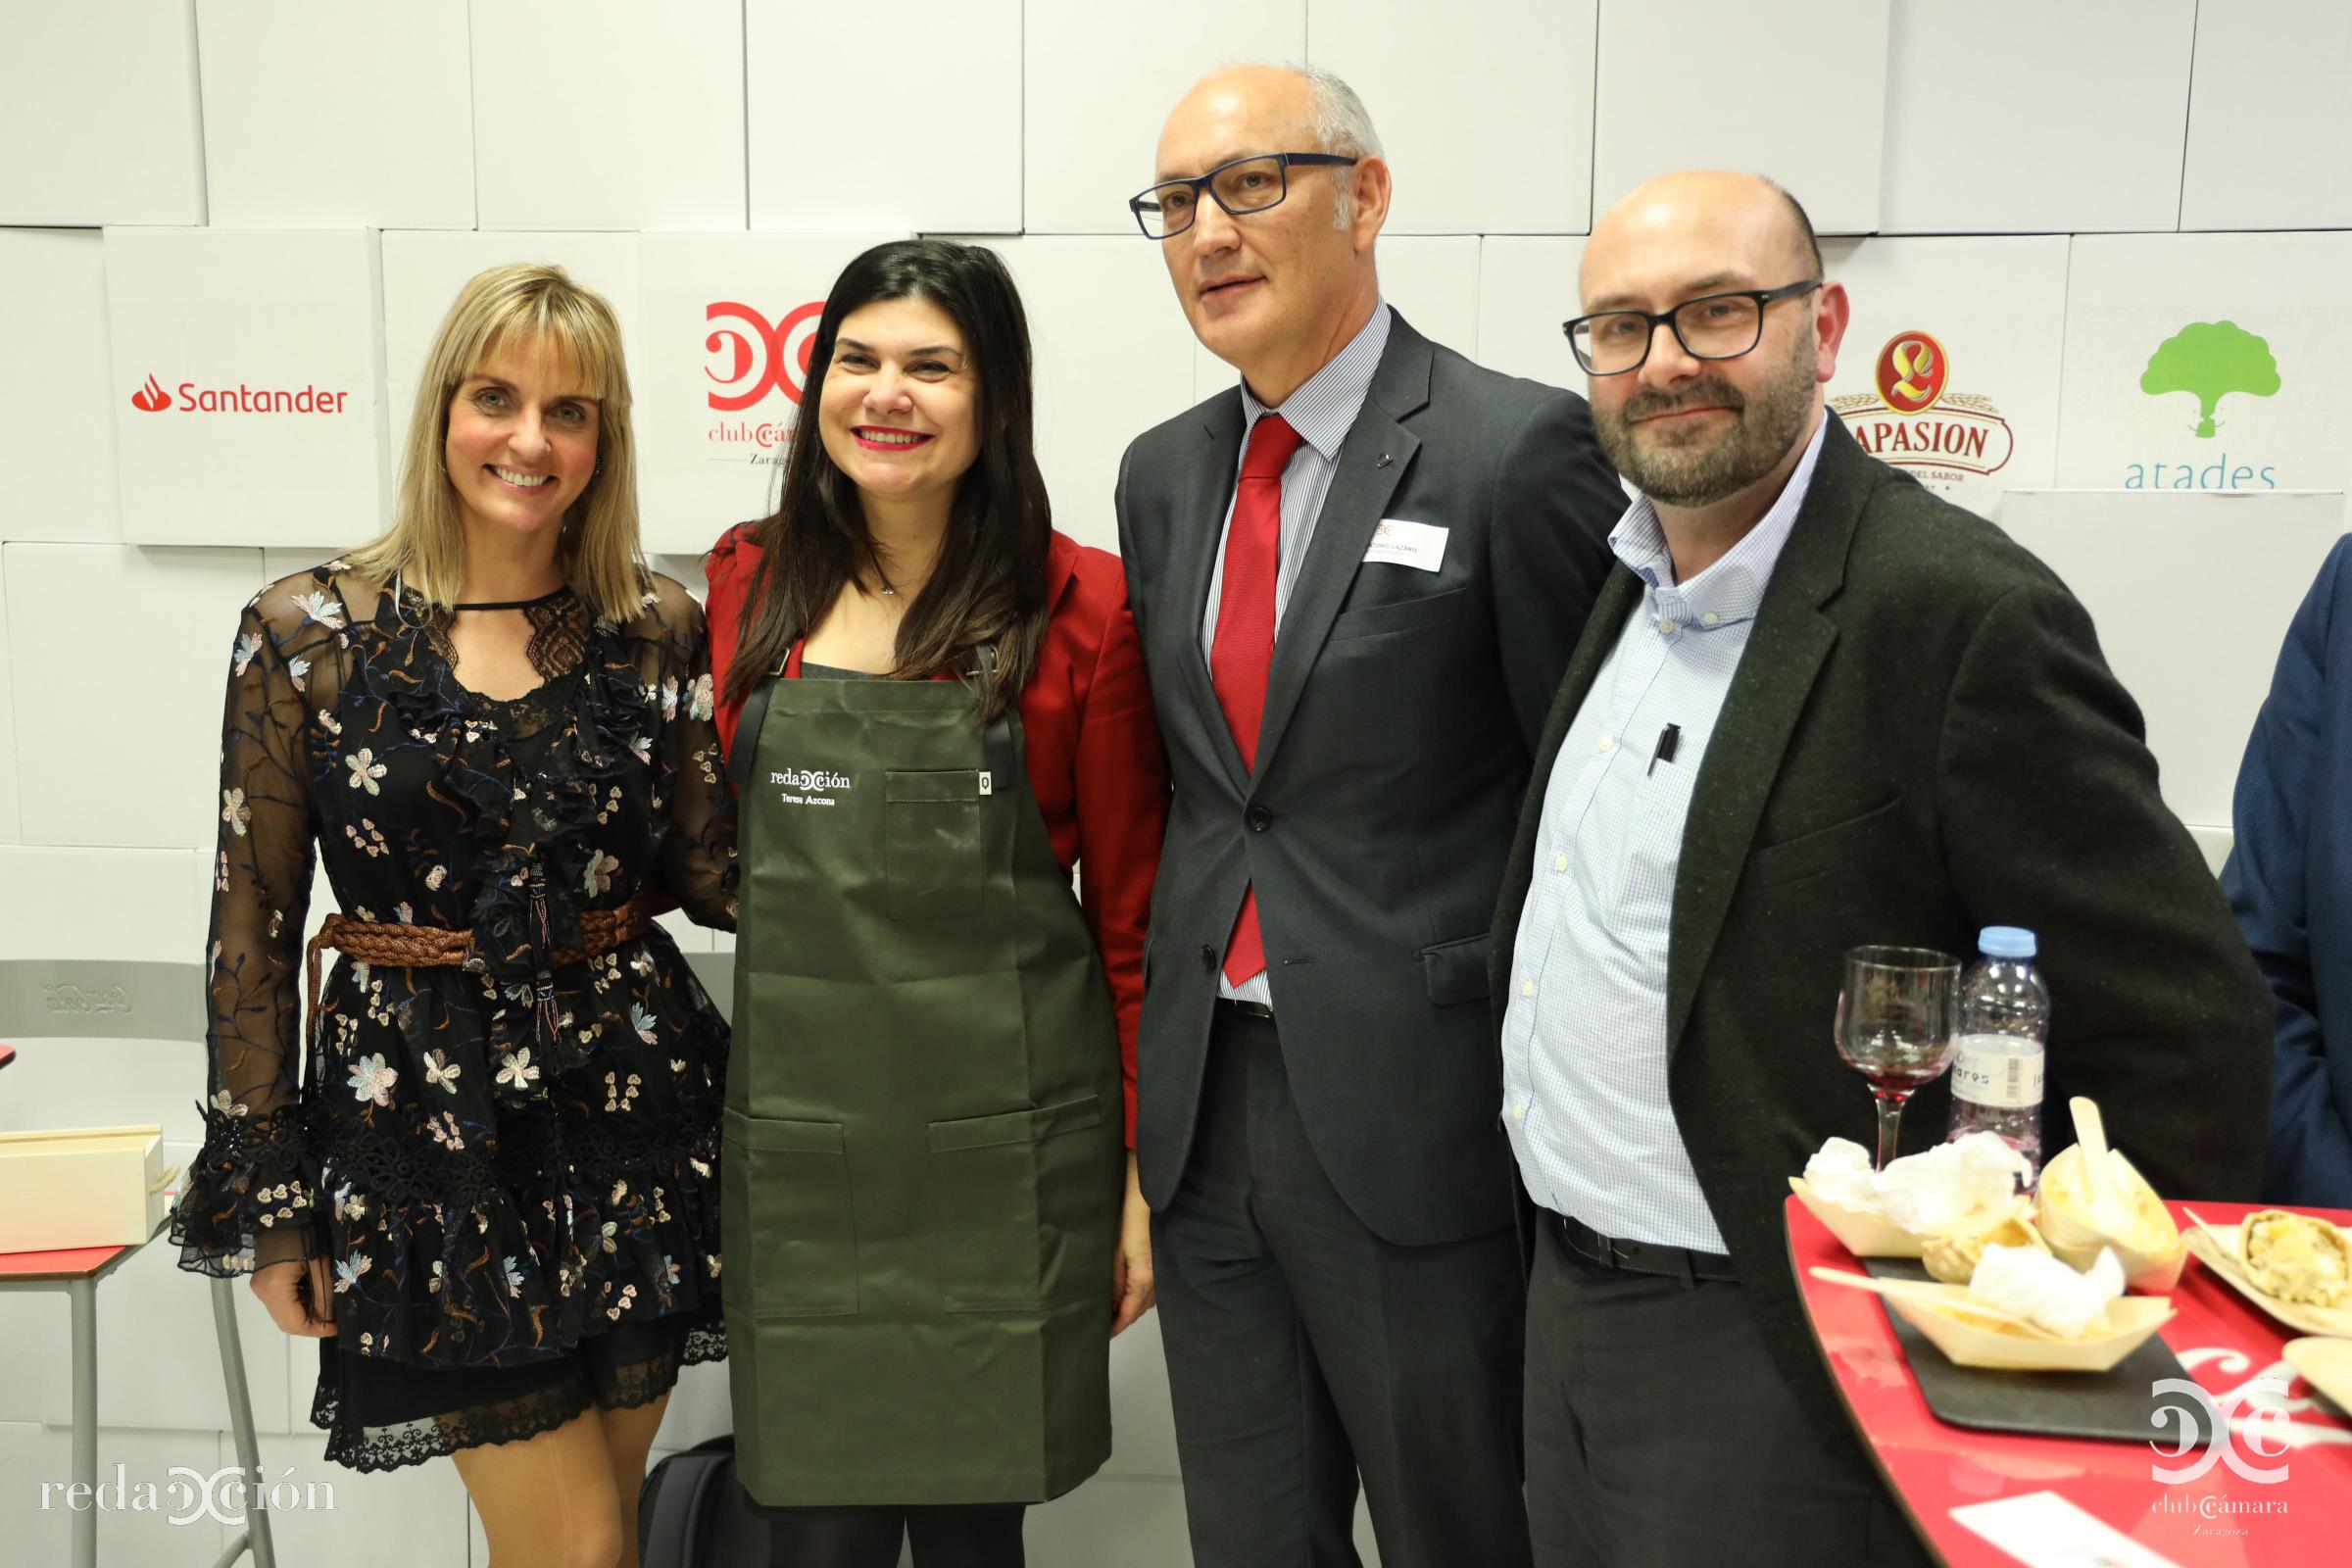 Mónica Manero, Teresa Azcona, José Antonio Lázaro , Ramón Añaños